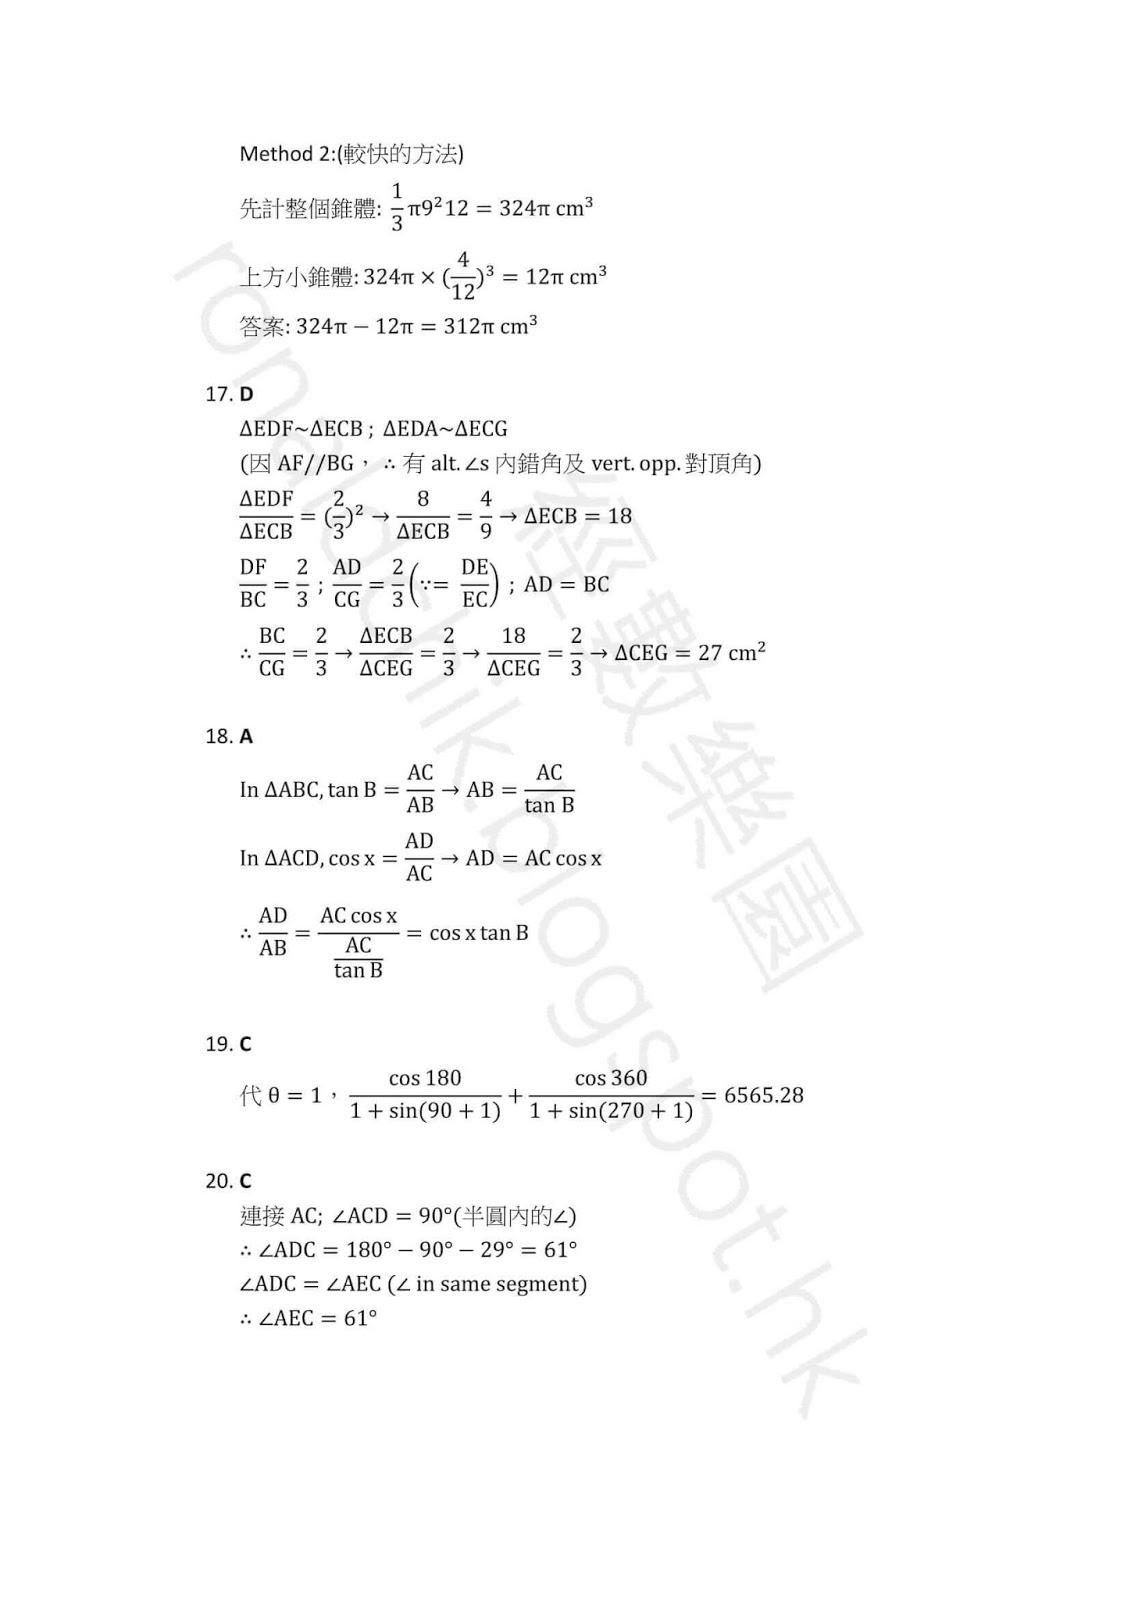 2015 DSE Math 數學 Paper 2 MC 卷二 答案 Q16,17,18,19,20